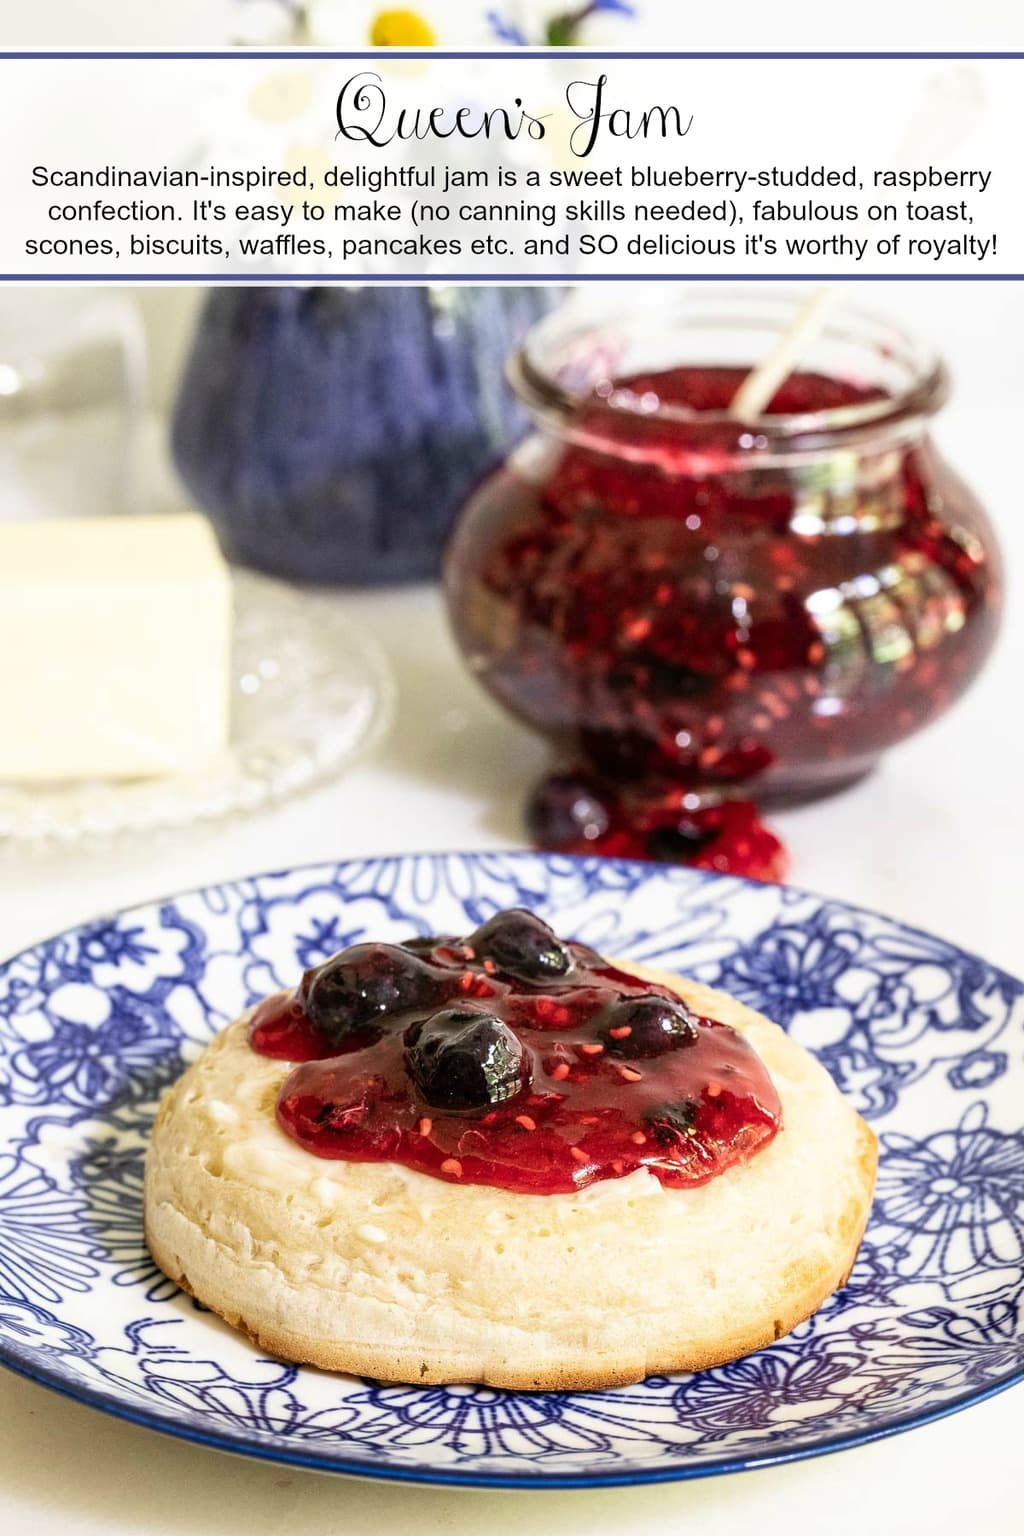 Queen's Jam (Raspberry Blueberry Jam)